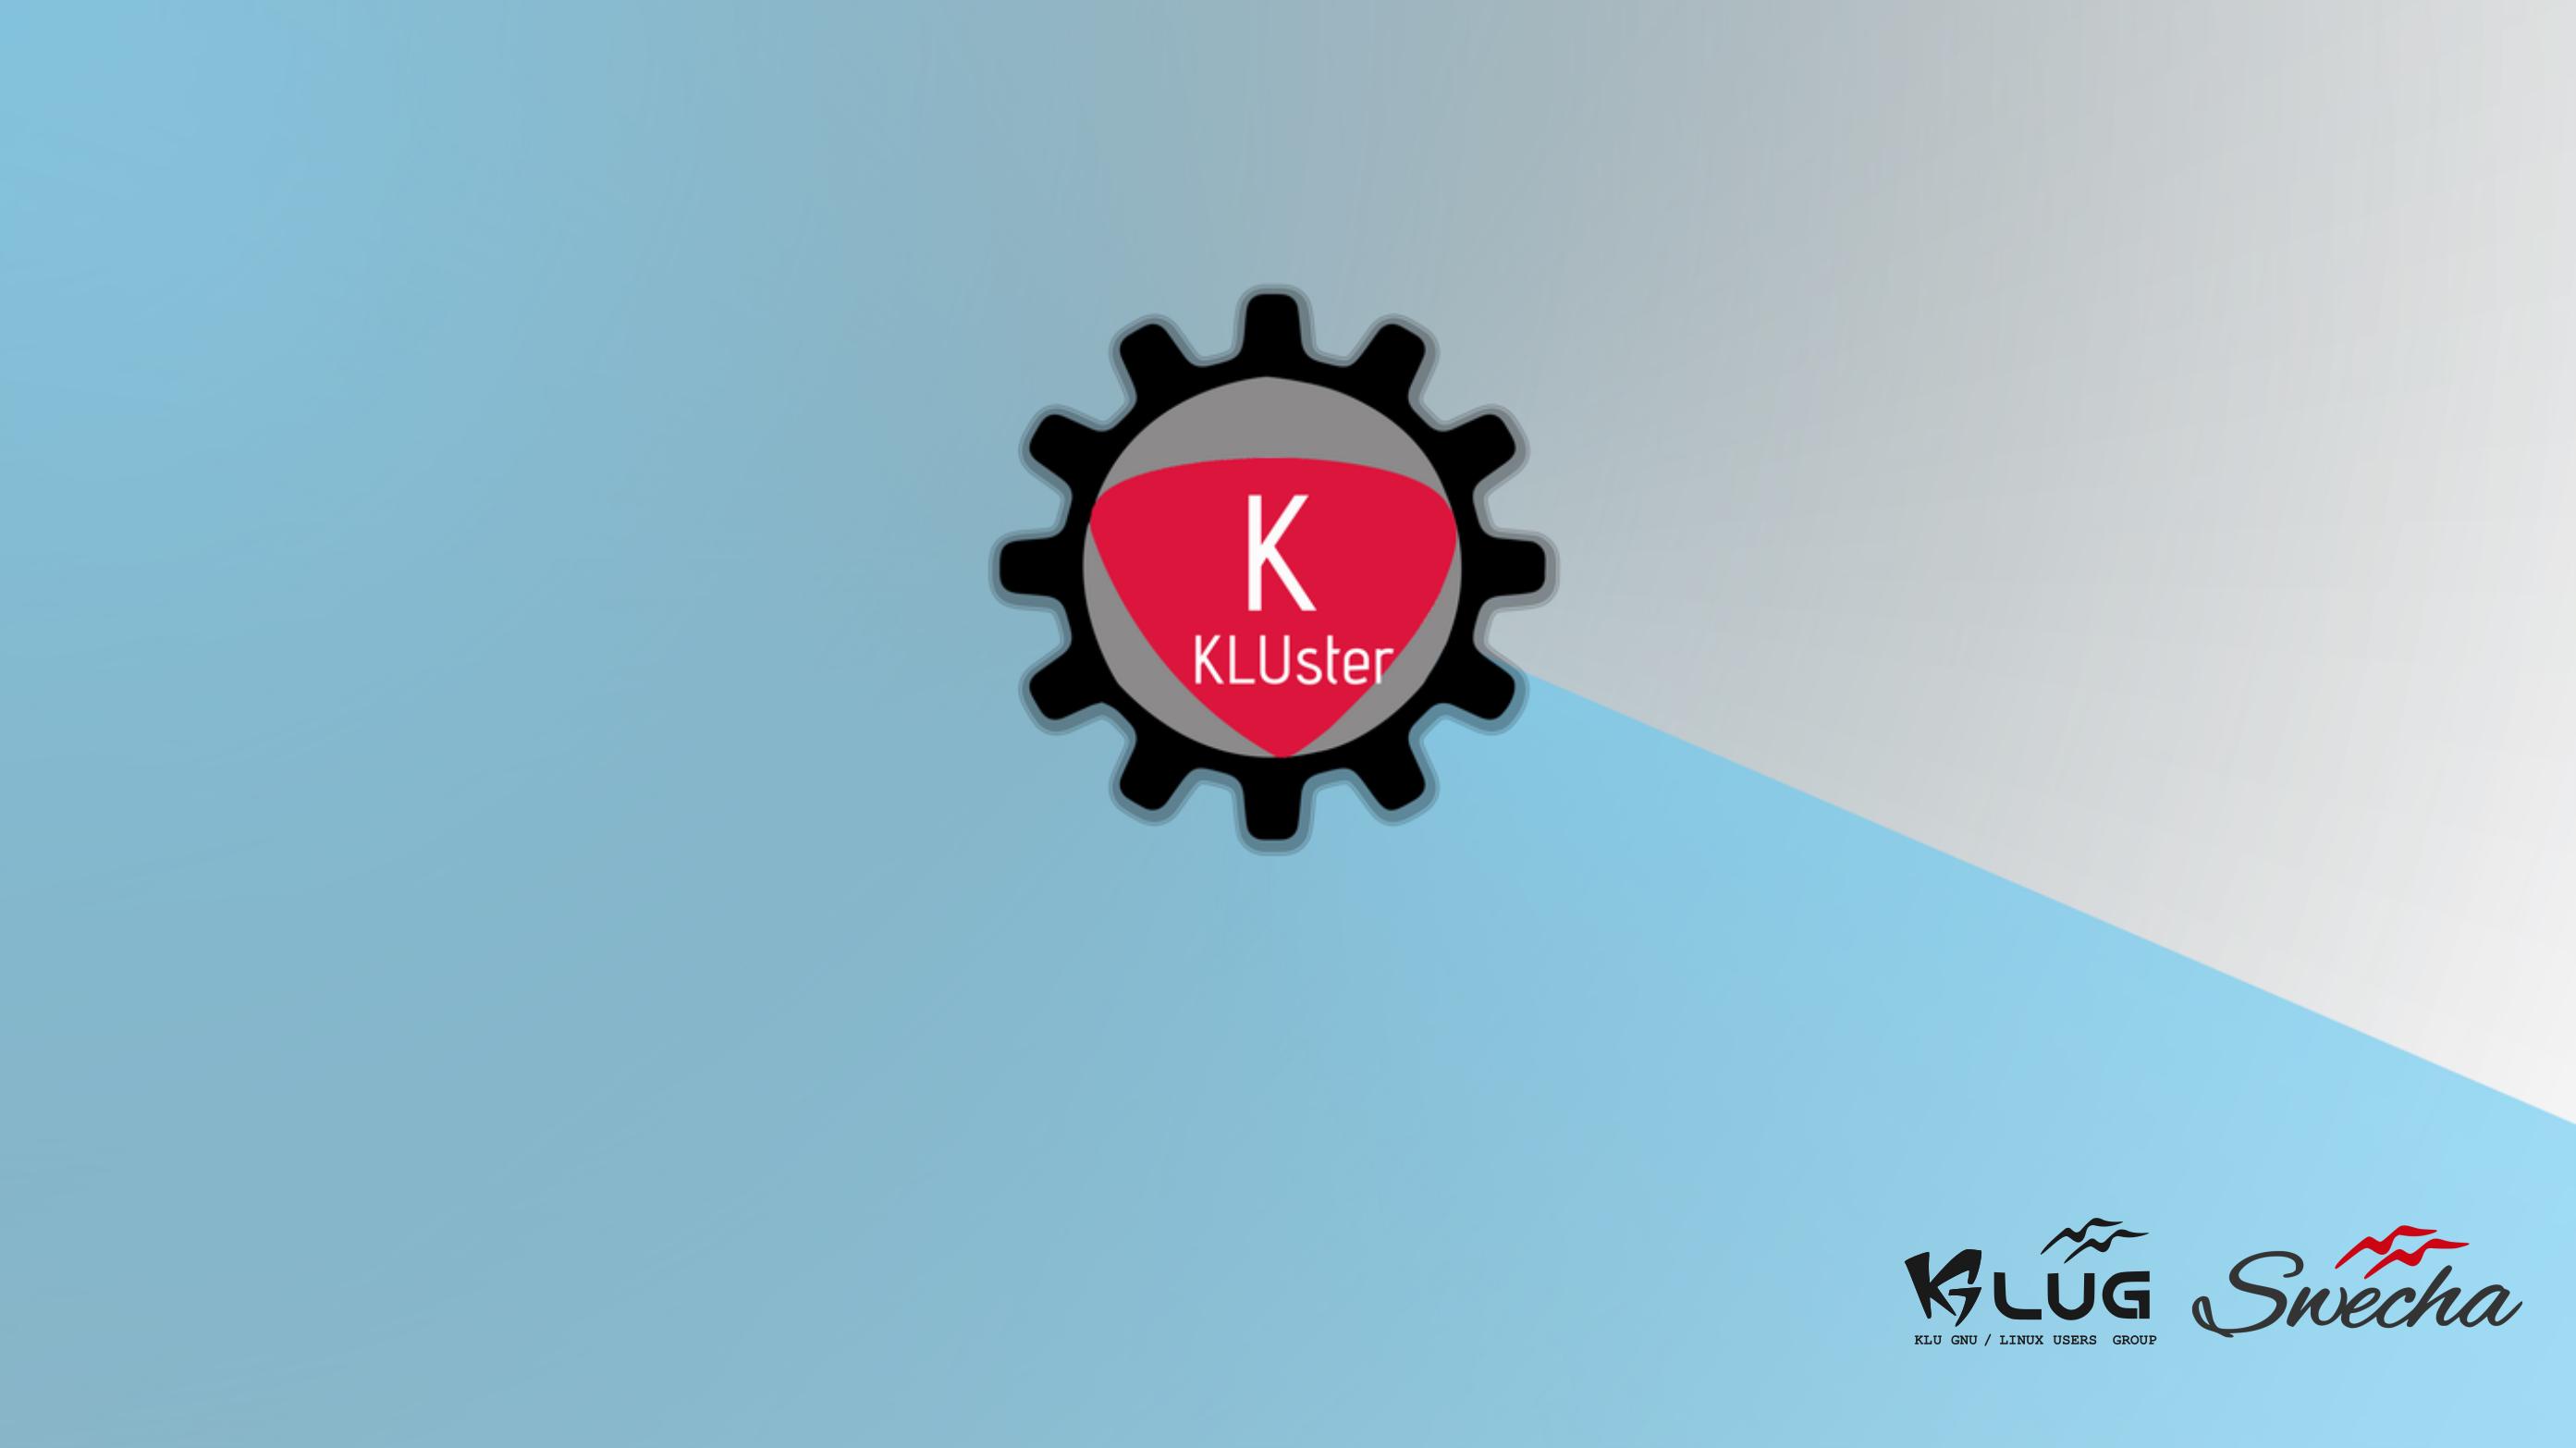 kluster wallpapers/KLster Official wallpaper.png